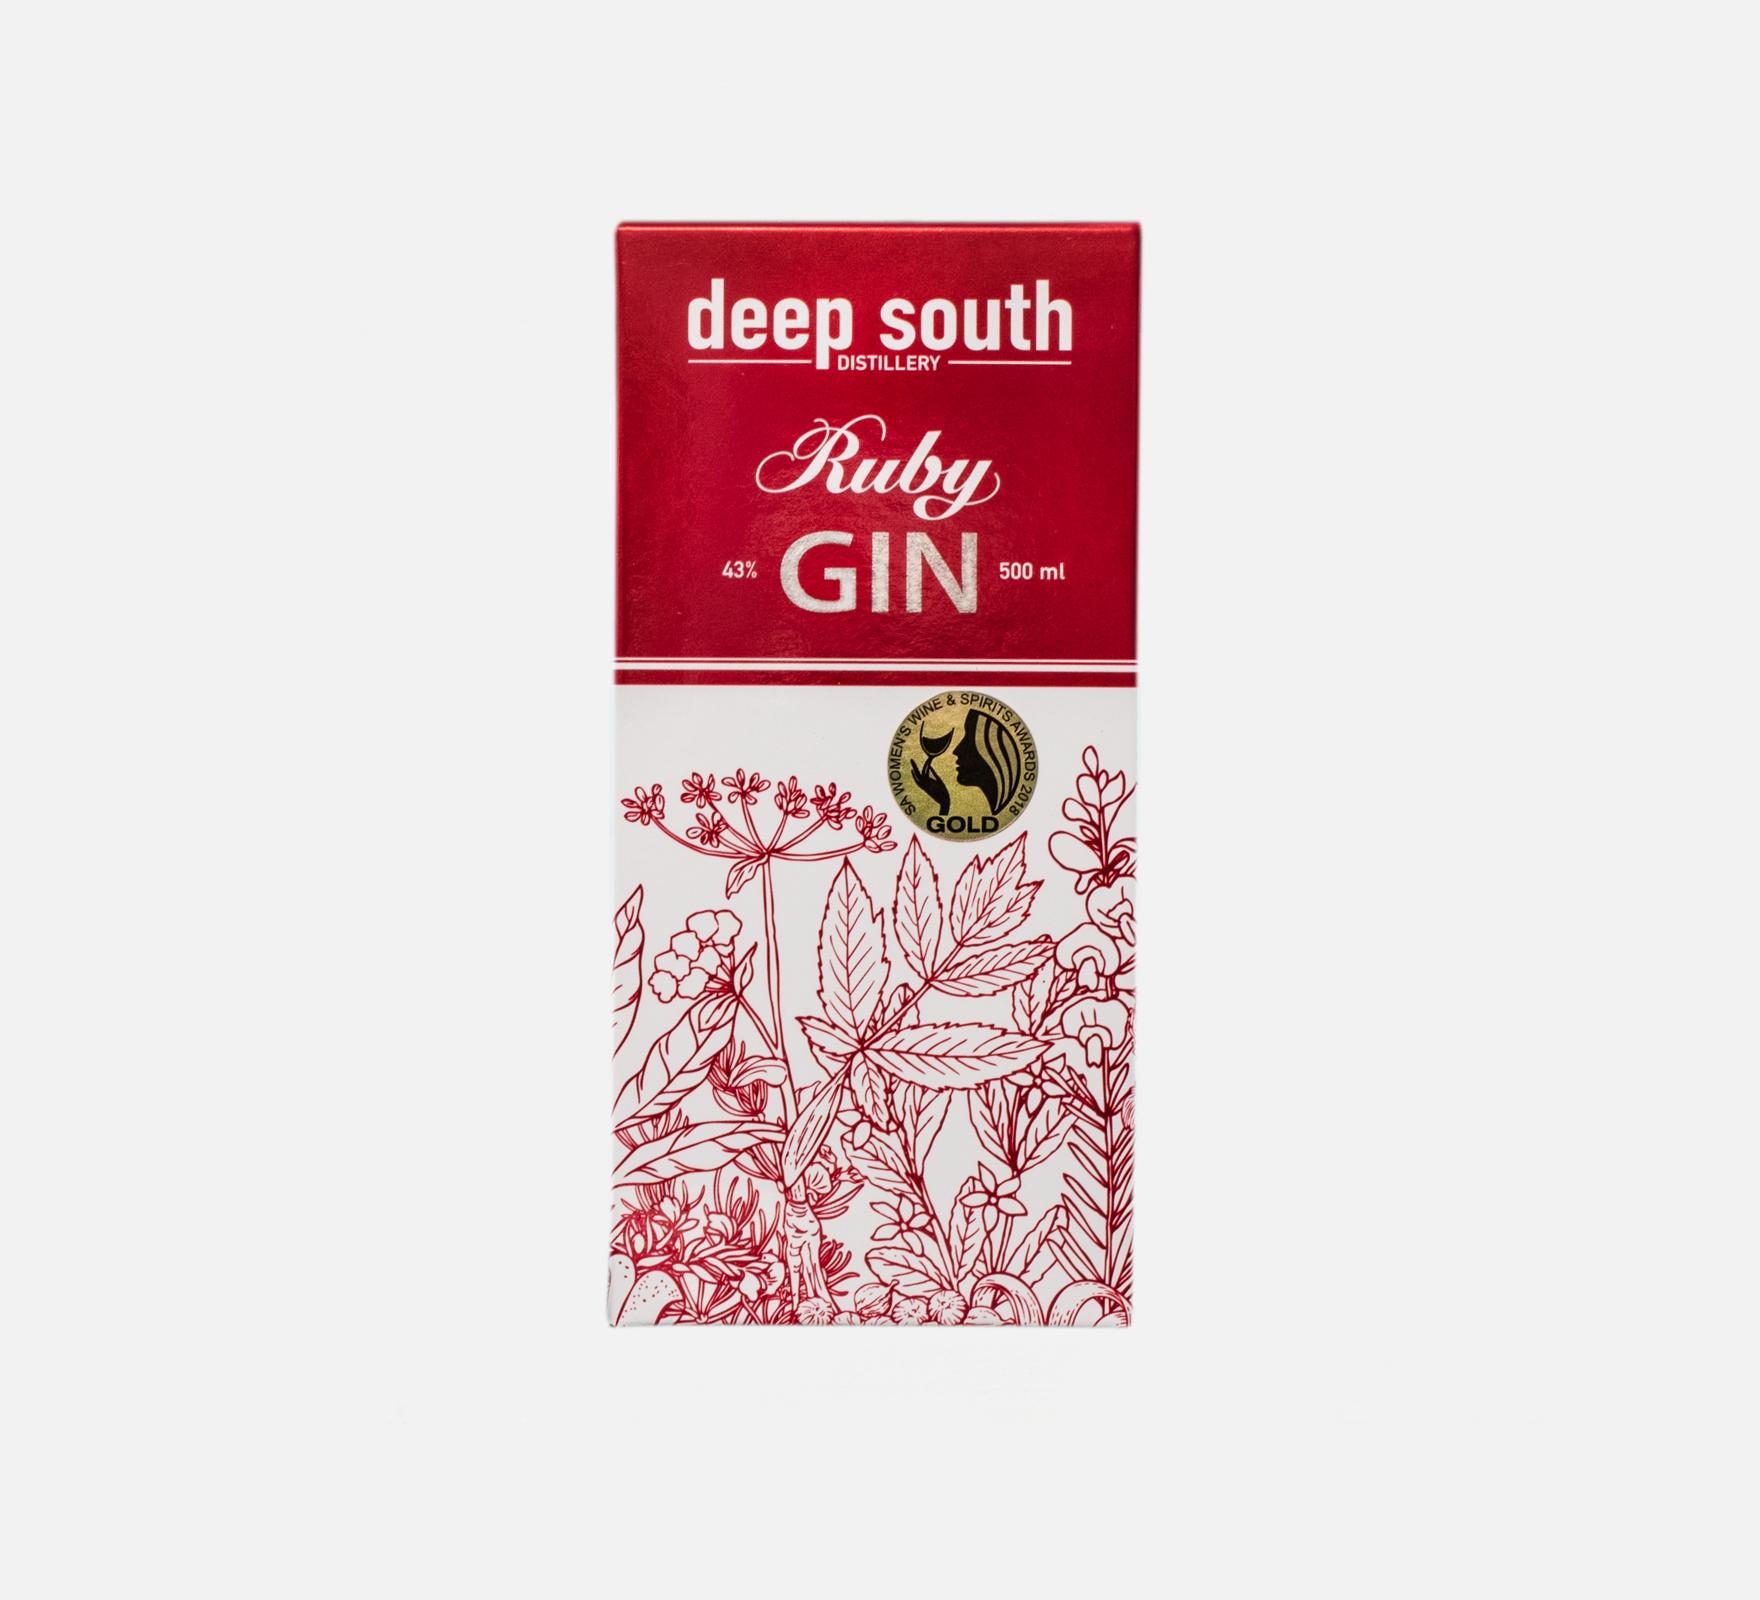 ruby-gin-Box.png